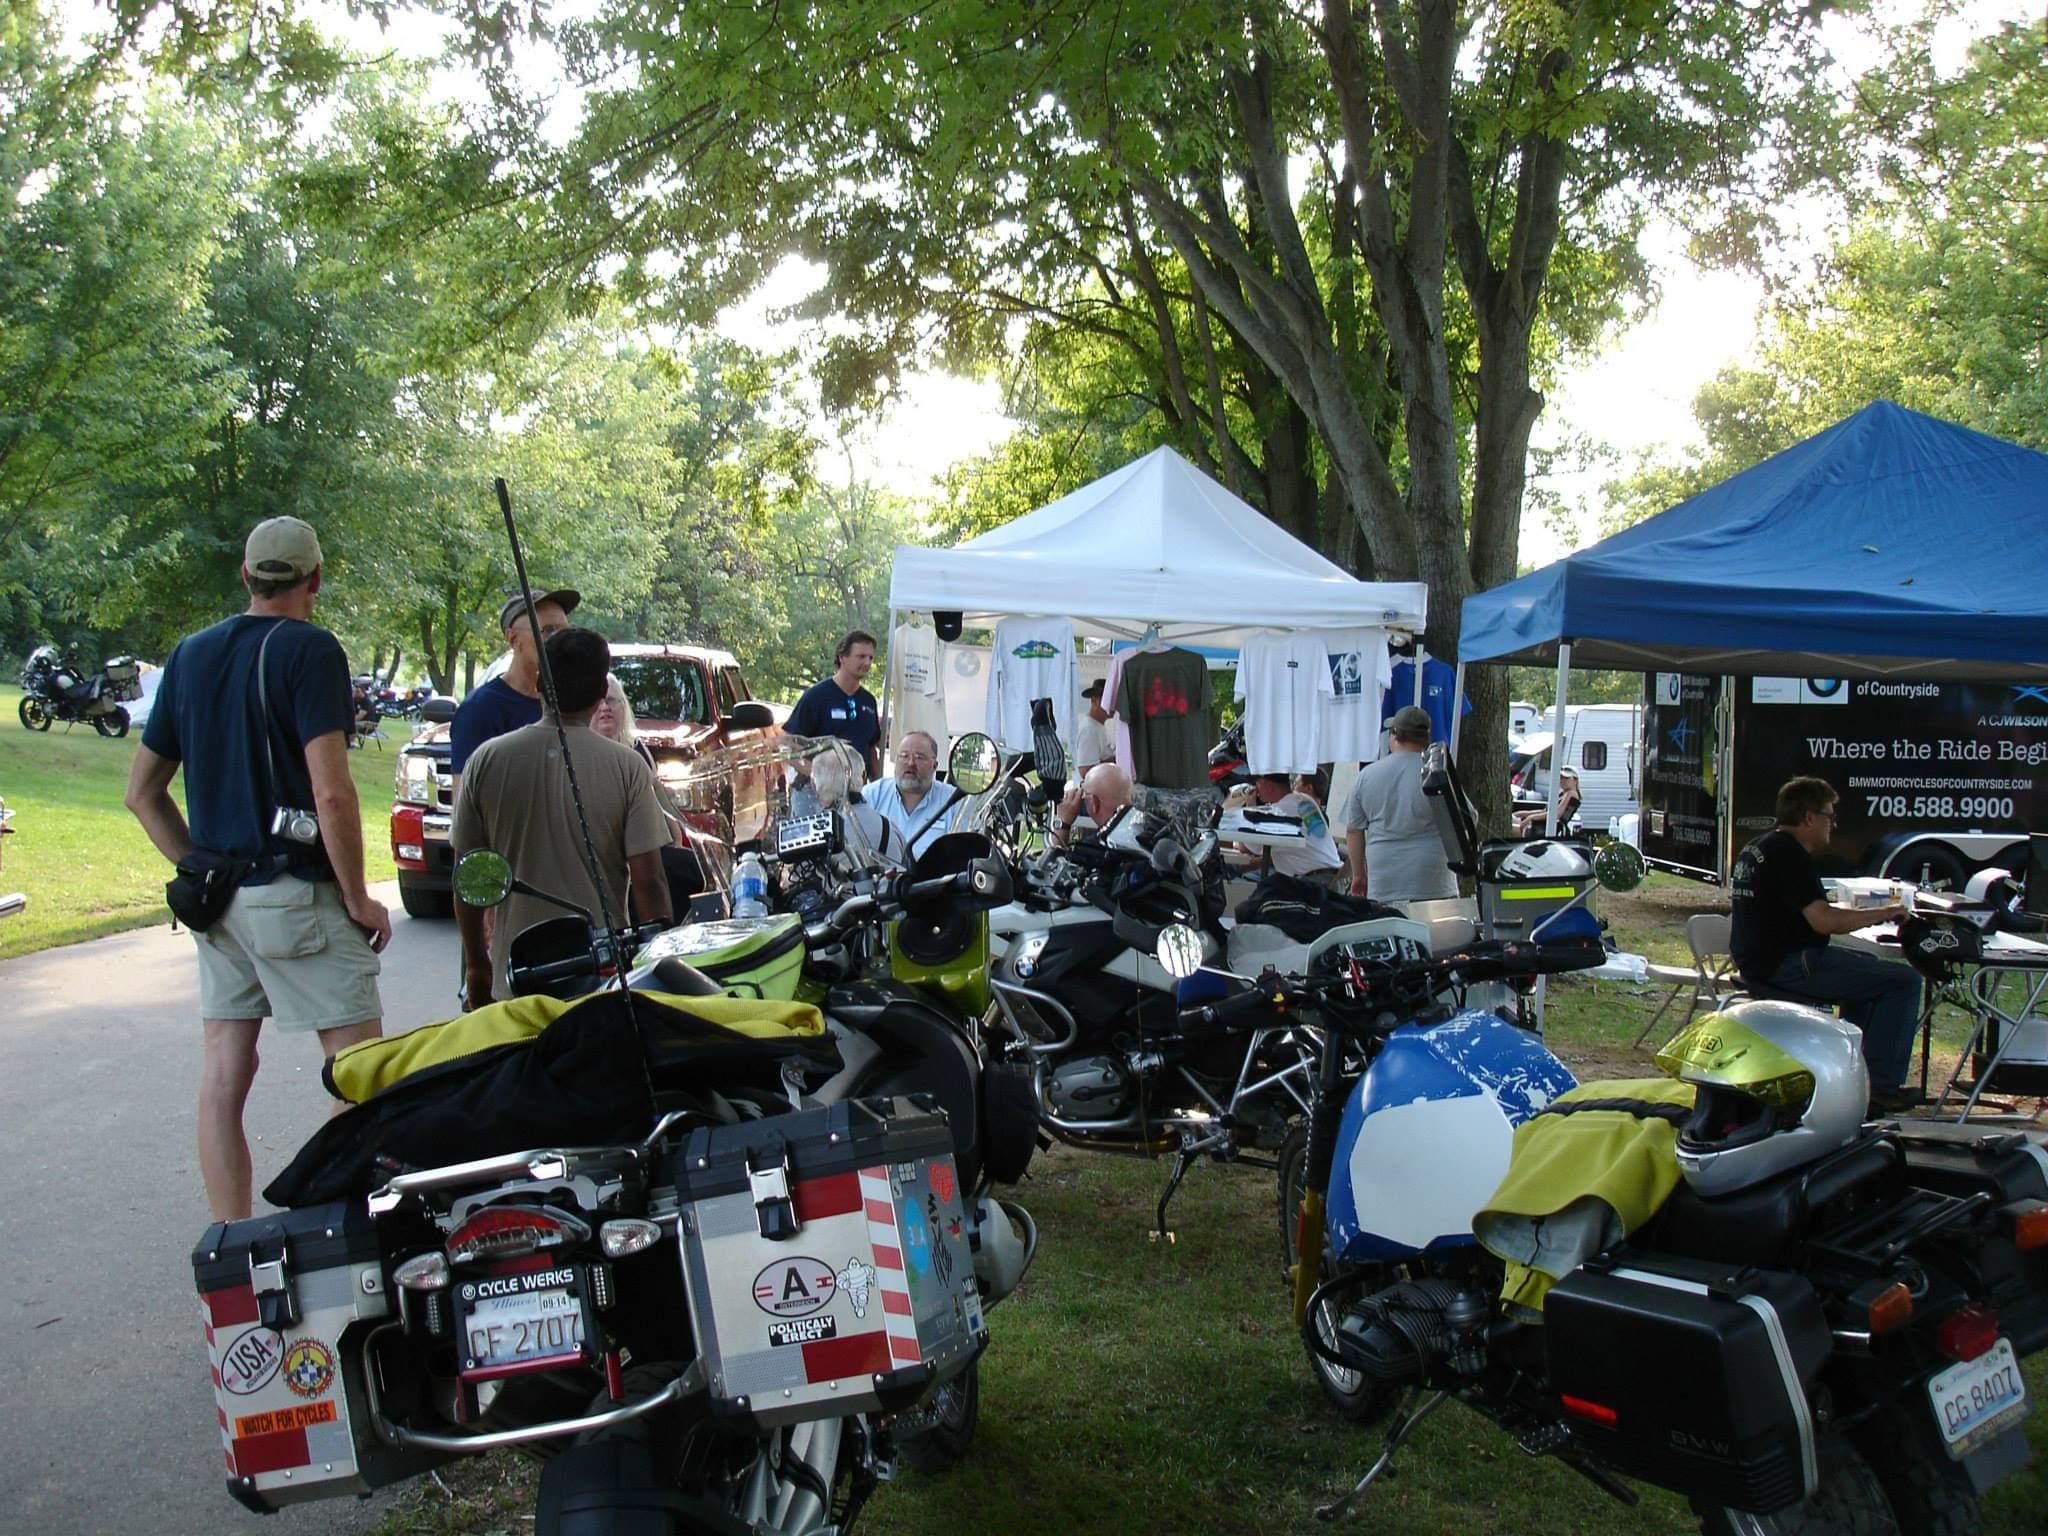 tent bikes